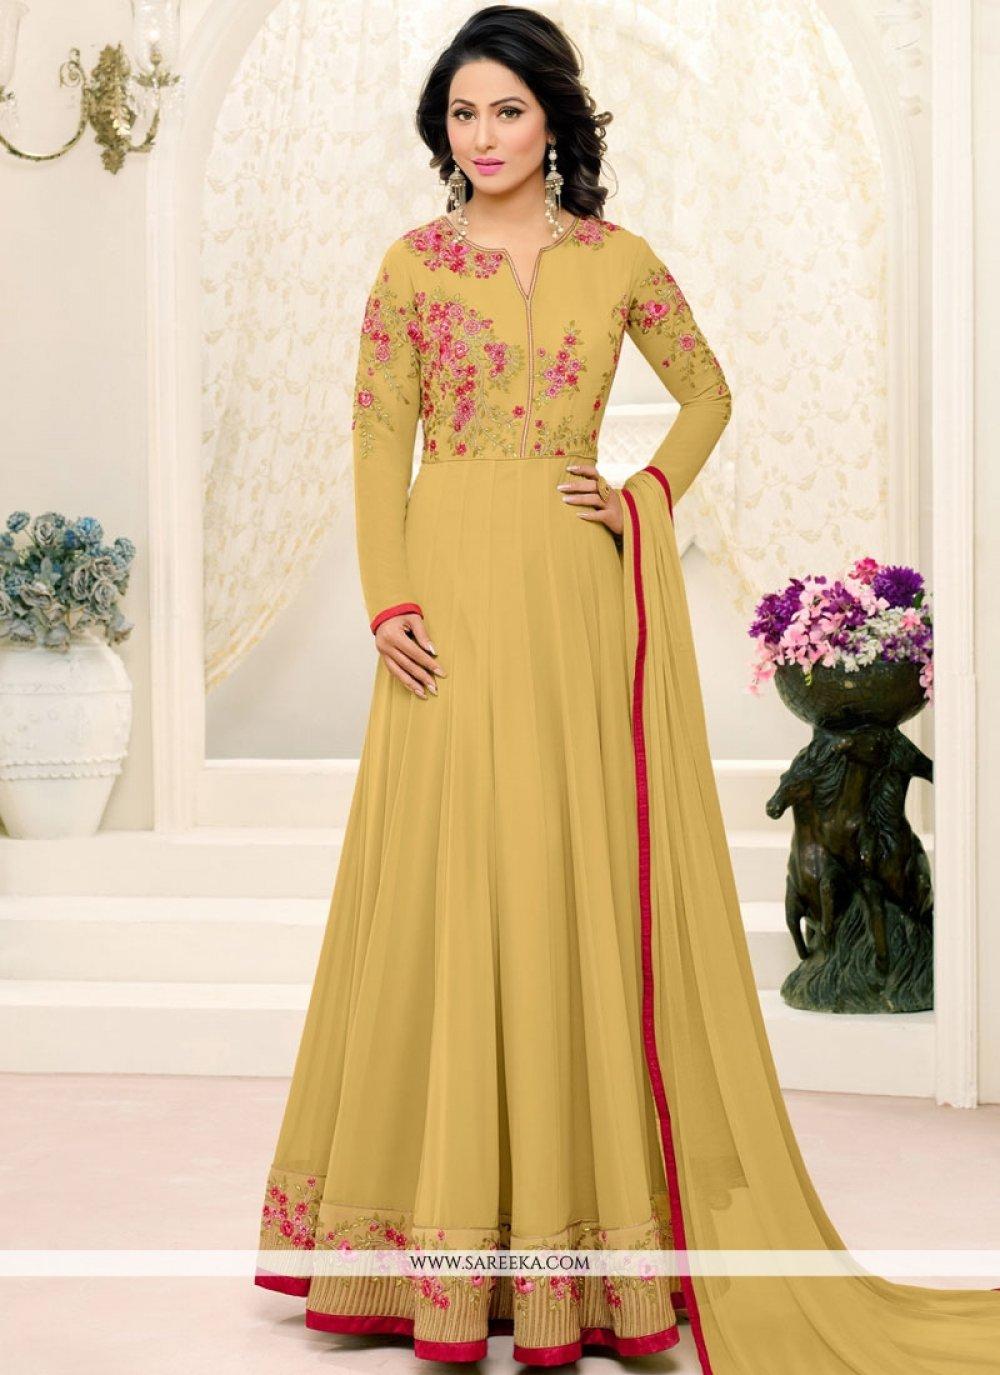 Hina Khan Faux Georgette Floor Length Anarkali Suit